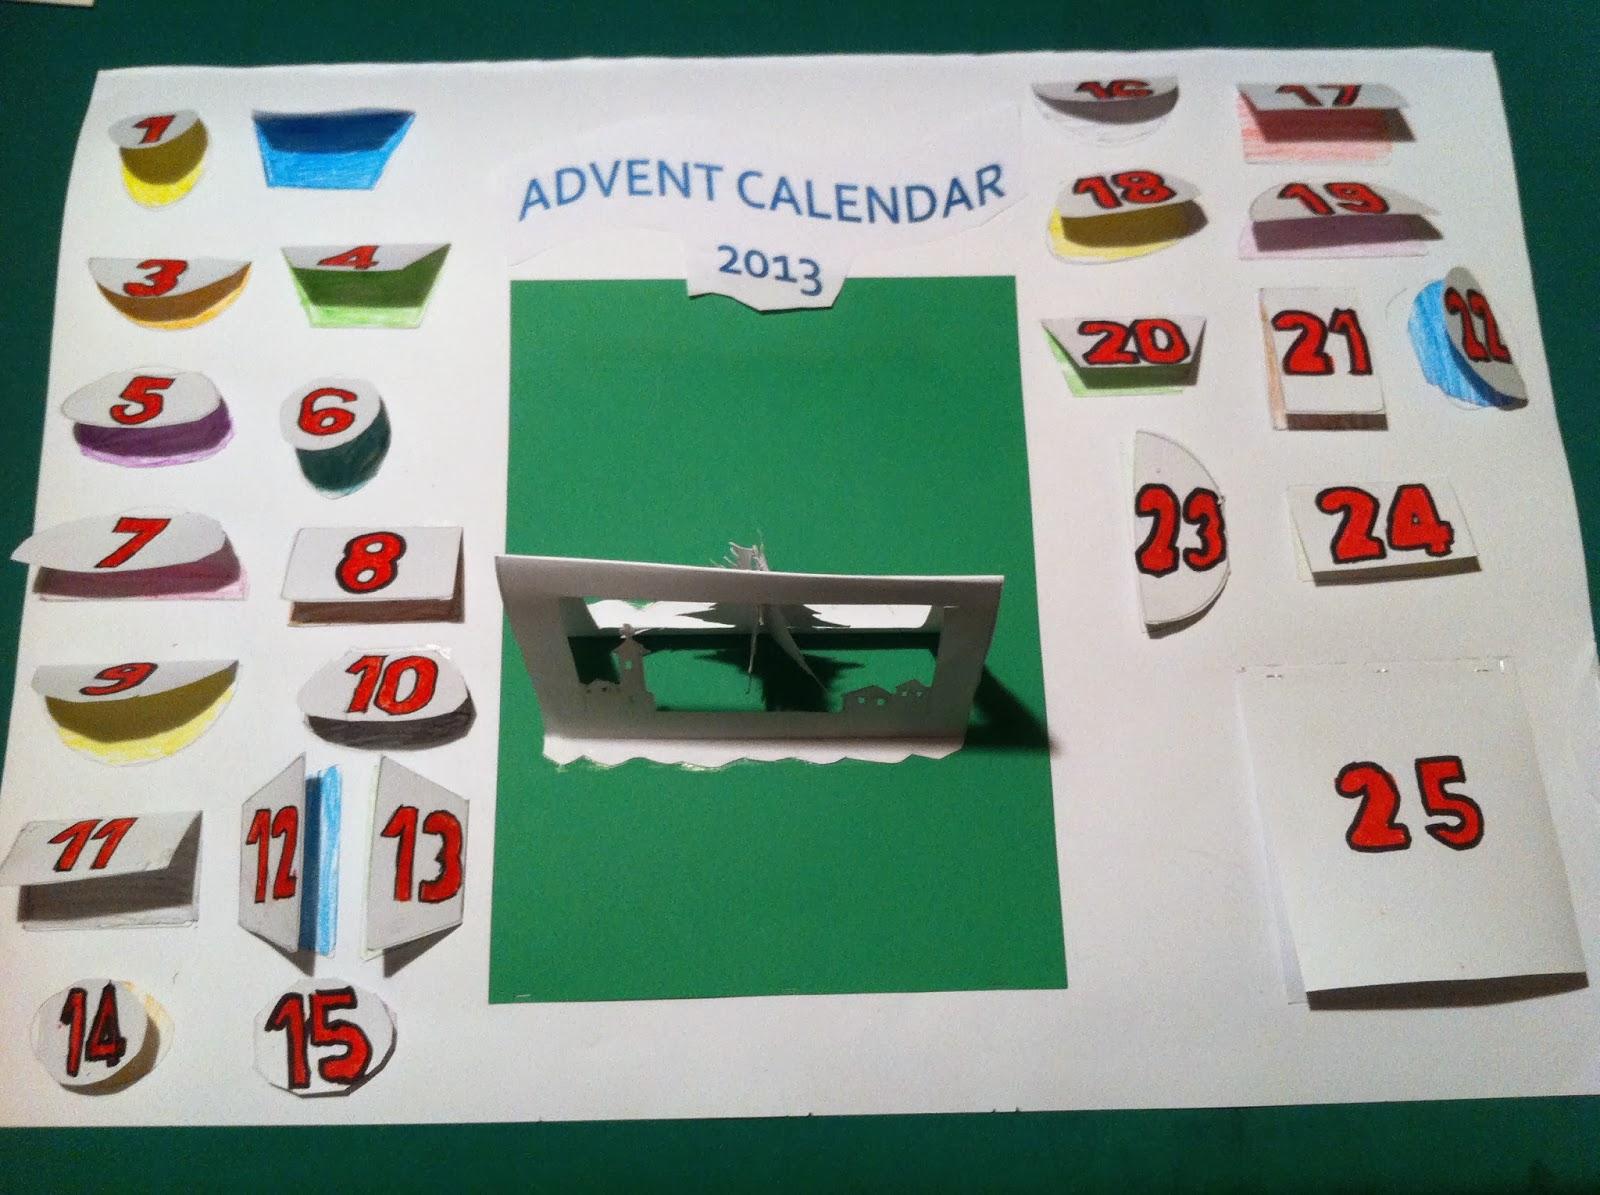 TrinityPat: Advent Calendar 2013